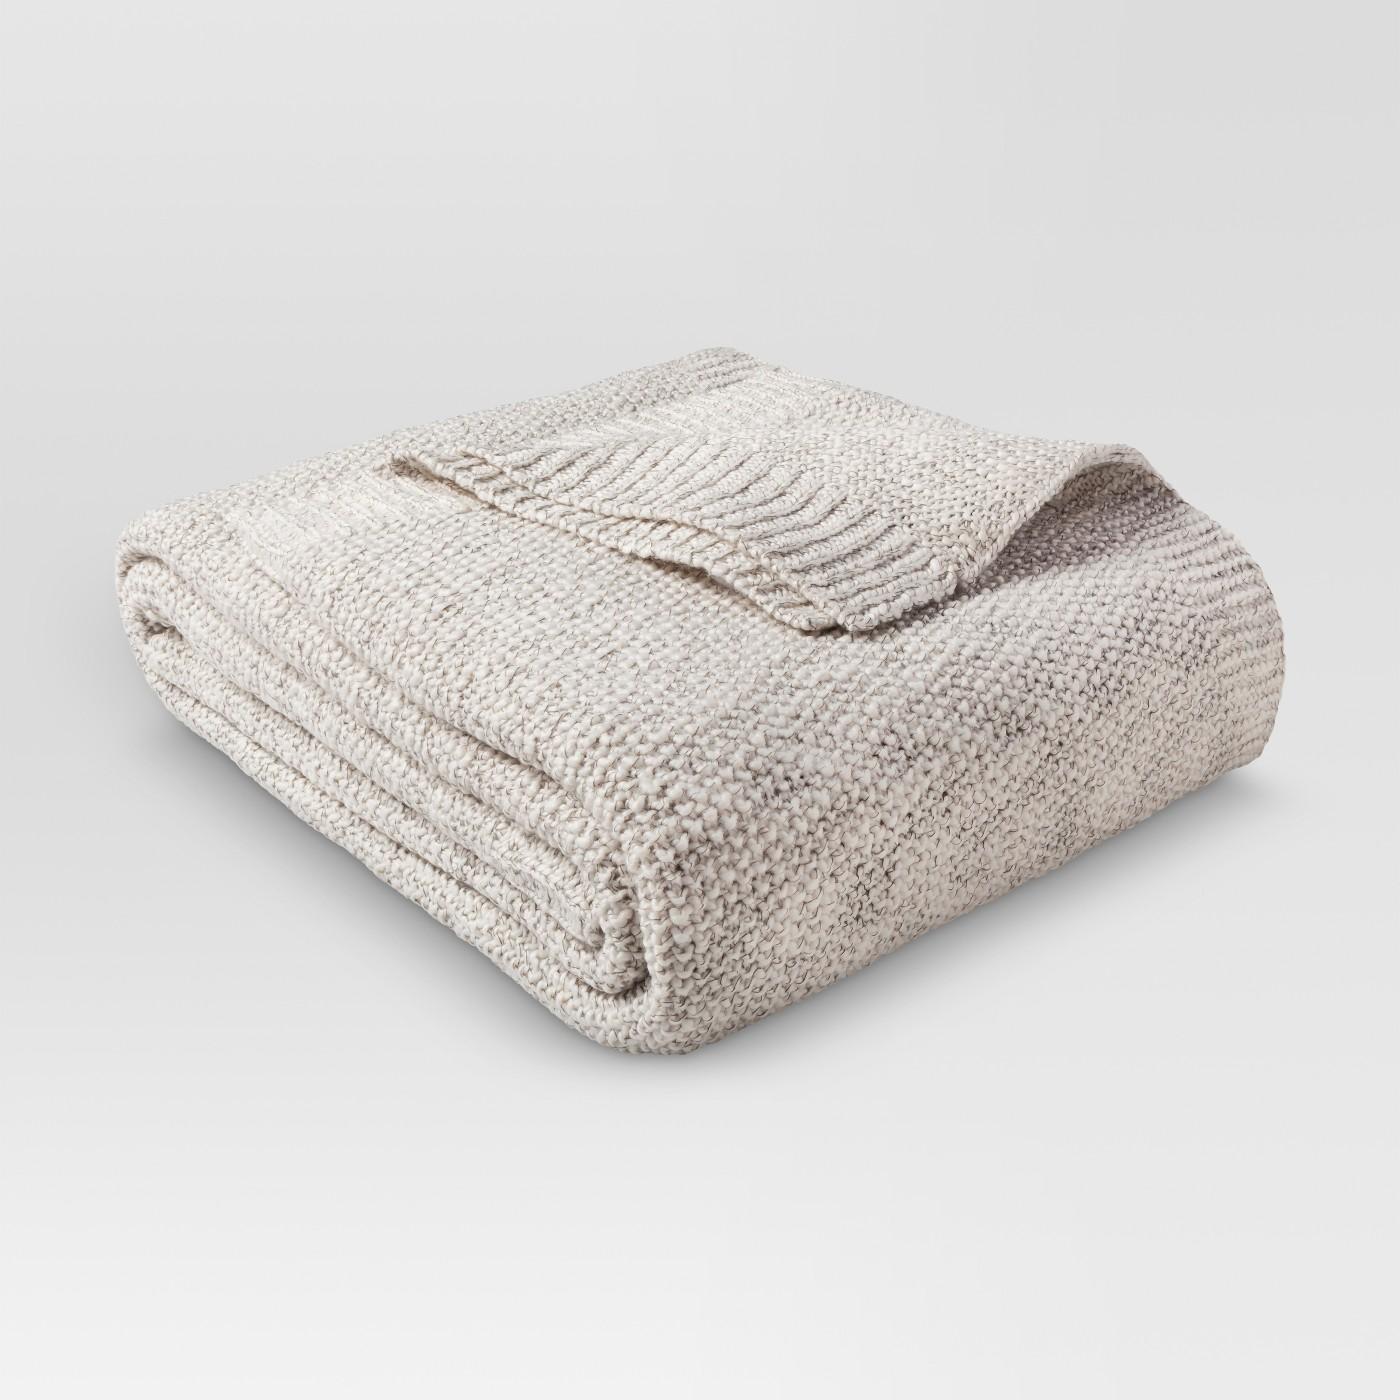 Blanket TArget.jpeg